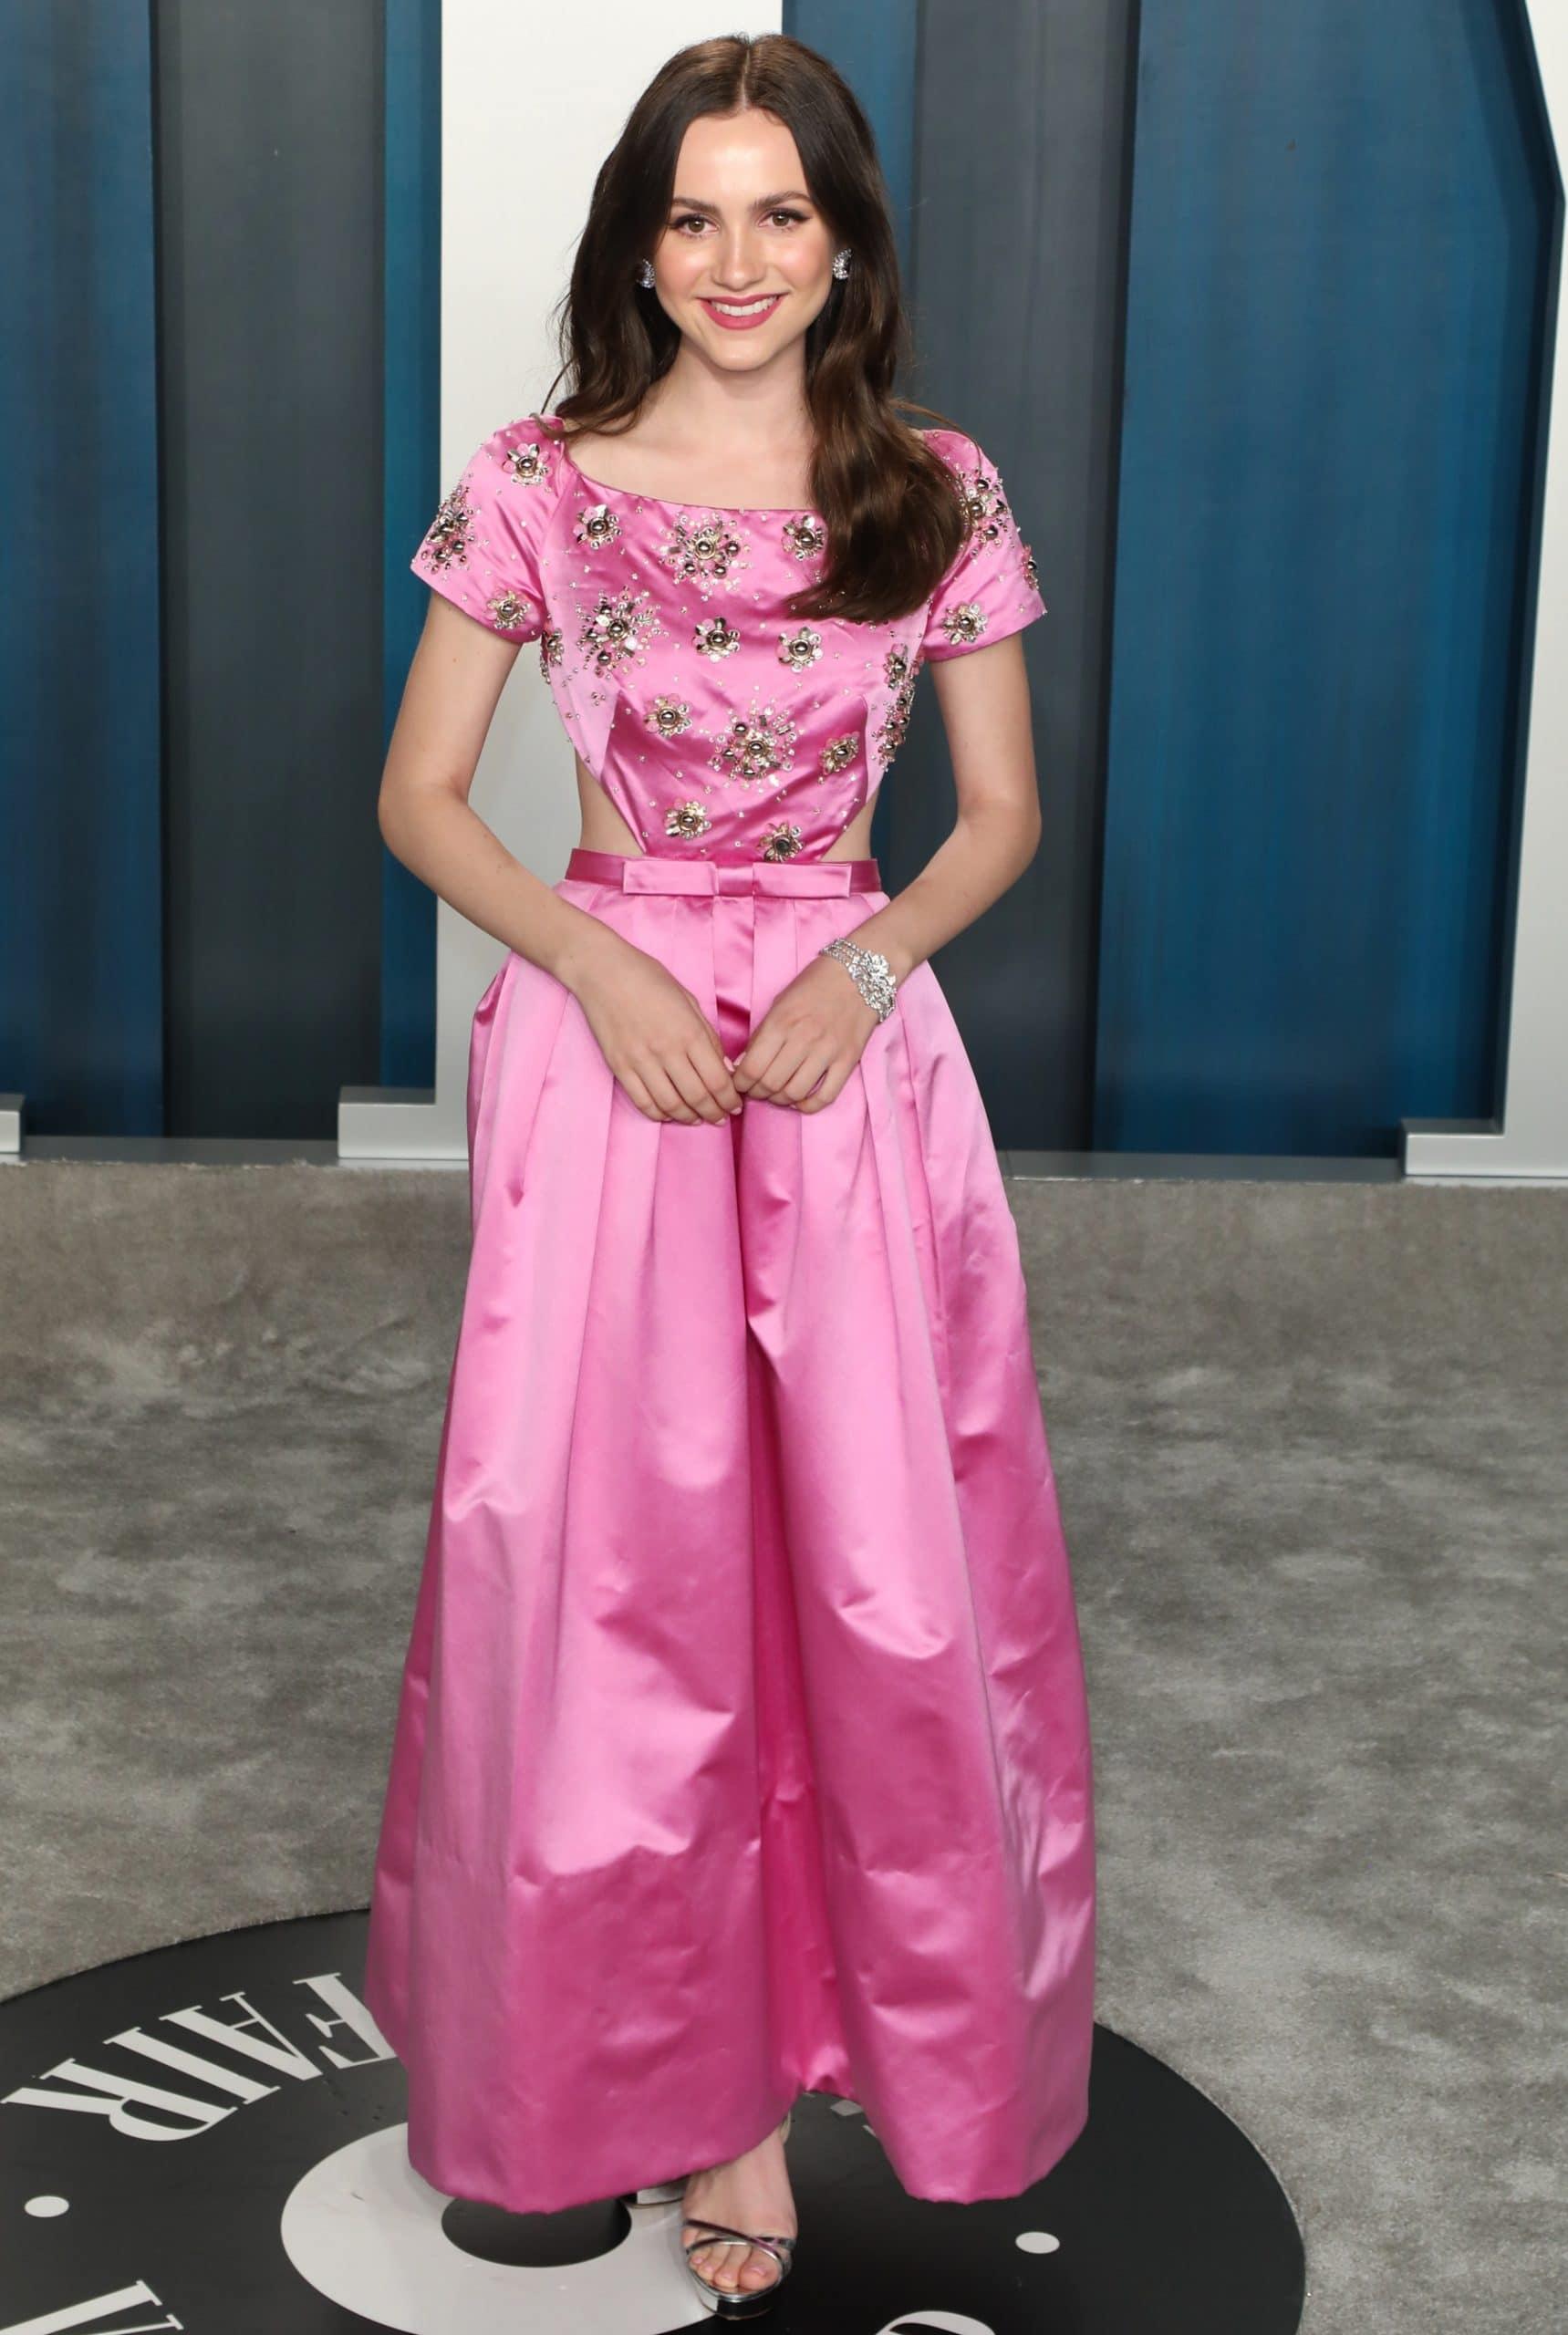 Maude Apatow in a Miu Miu dress at the 2020 Vanity Fair Oscar Party